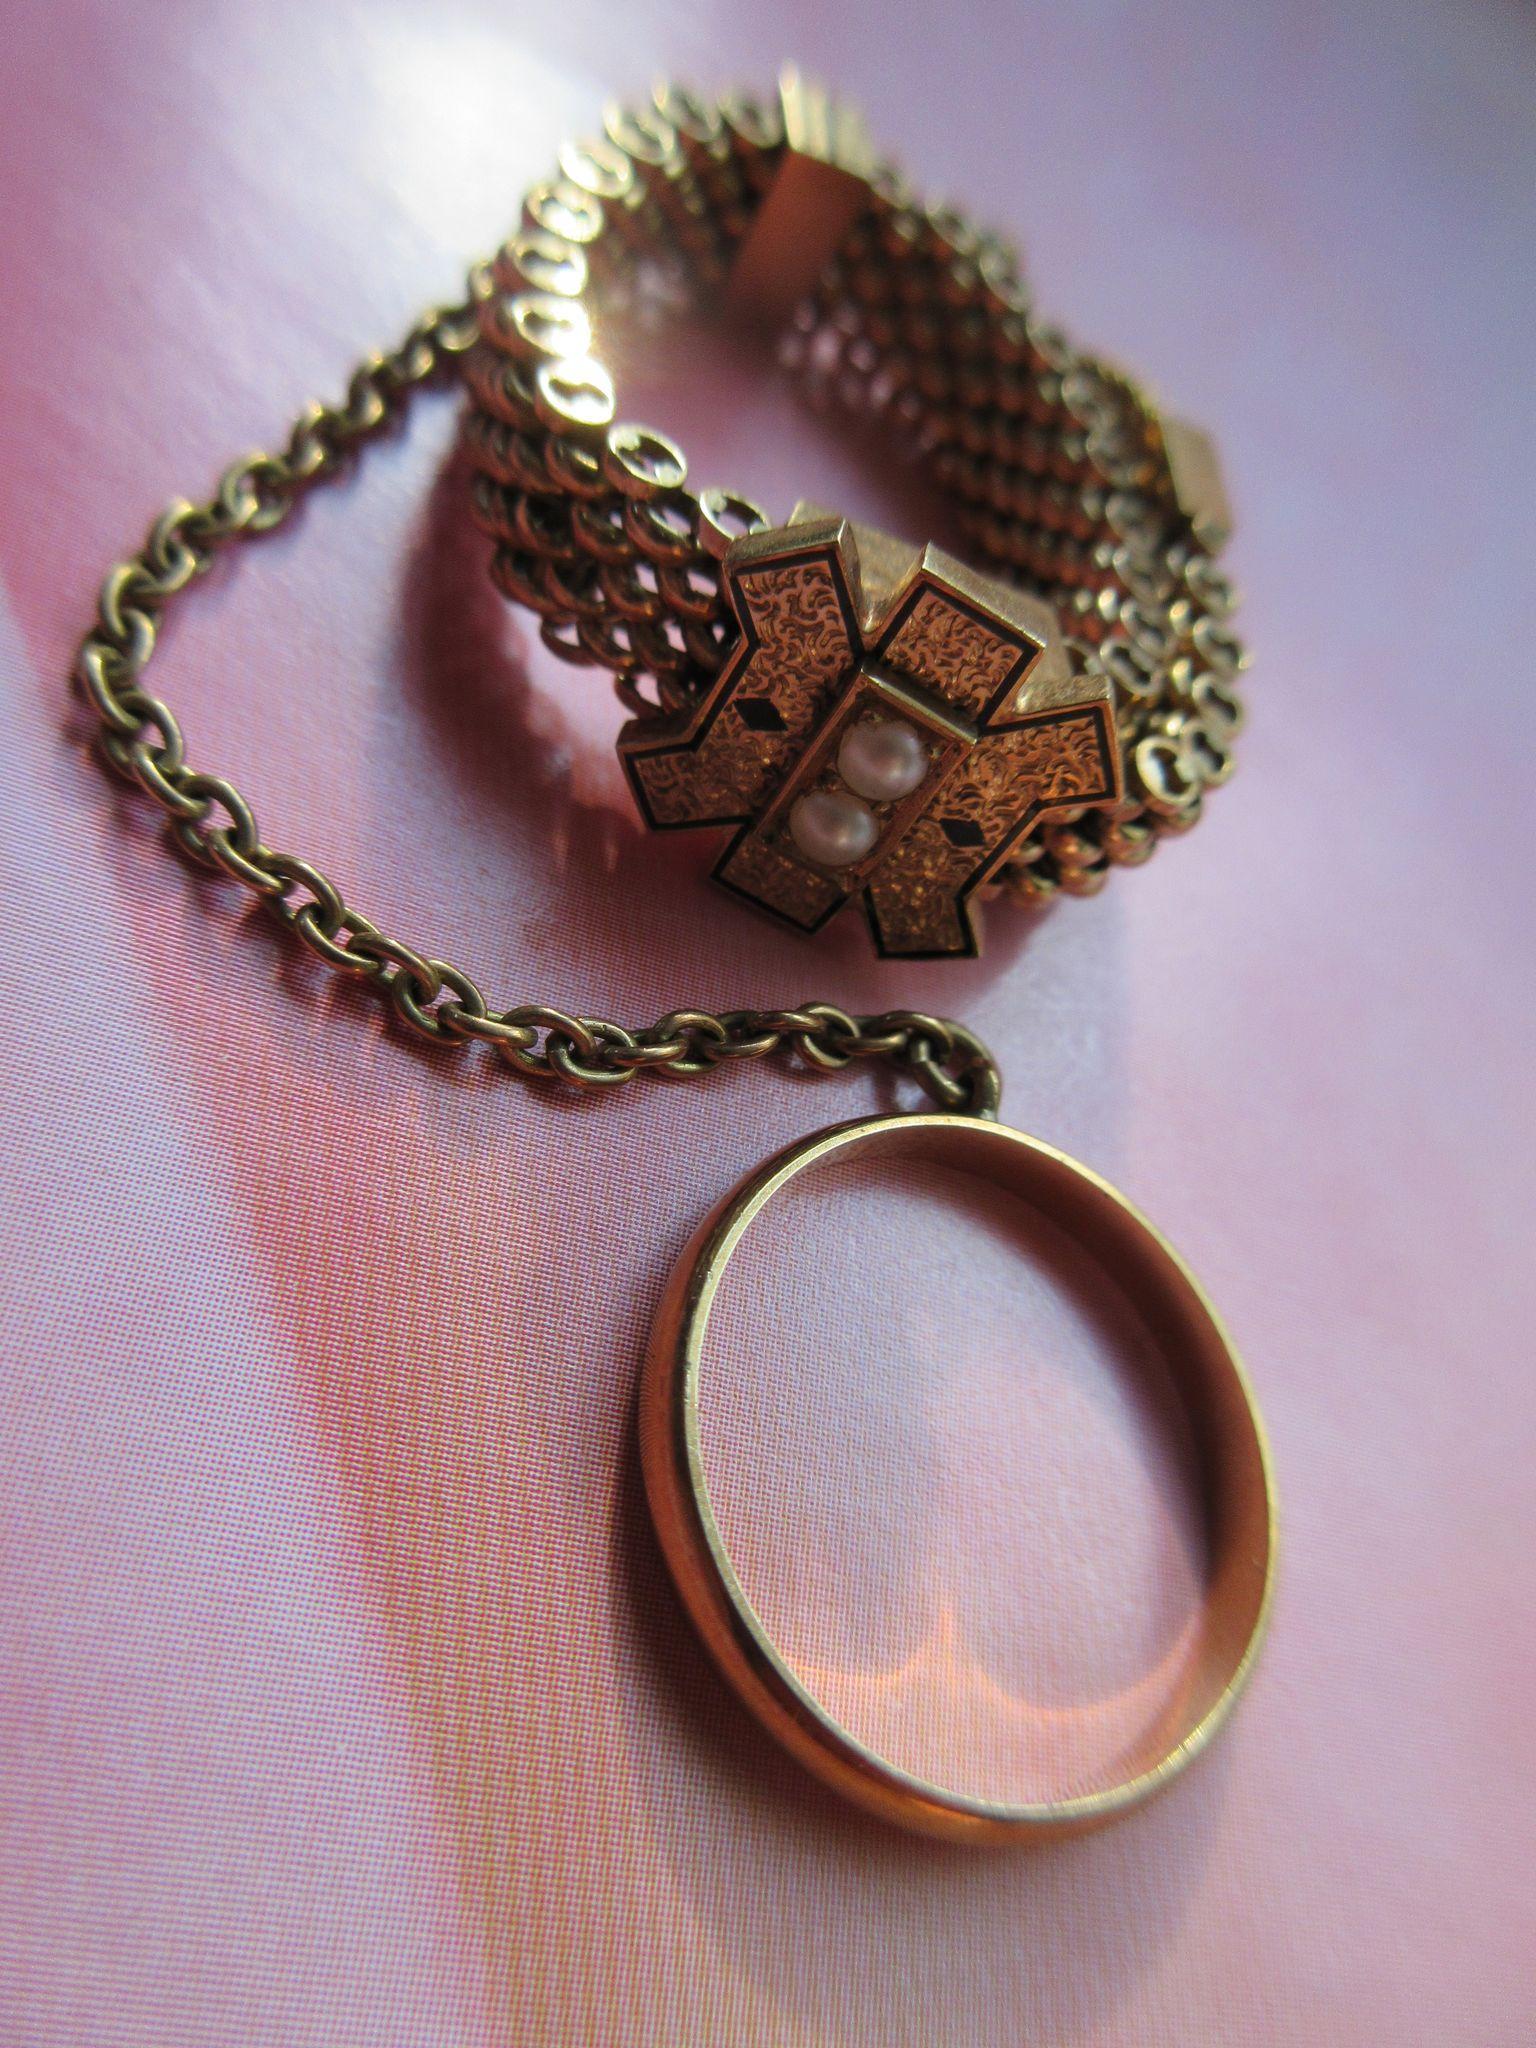 Victorian 14K Hankie Holder Brides Accessory Antique Buckle Jewelry